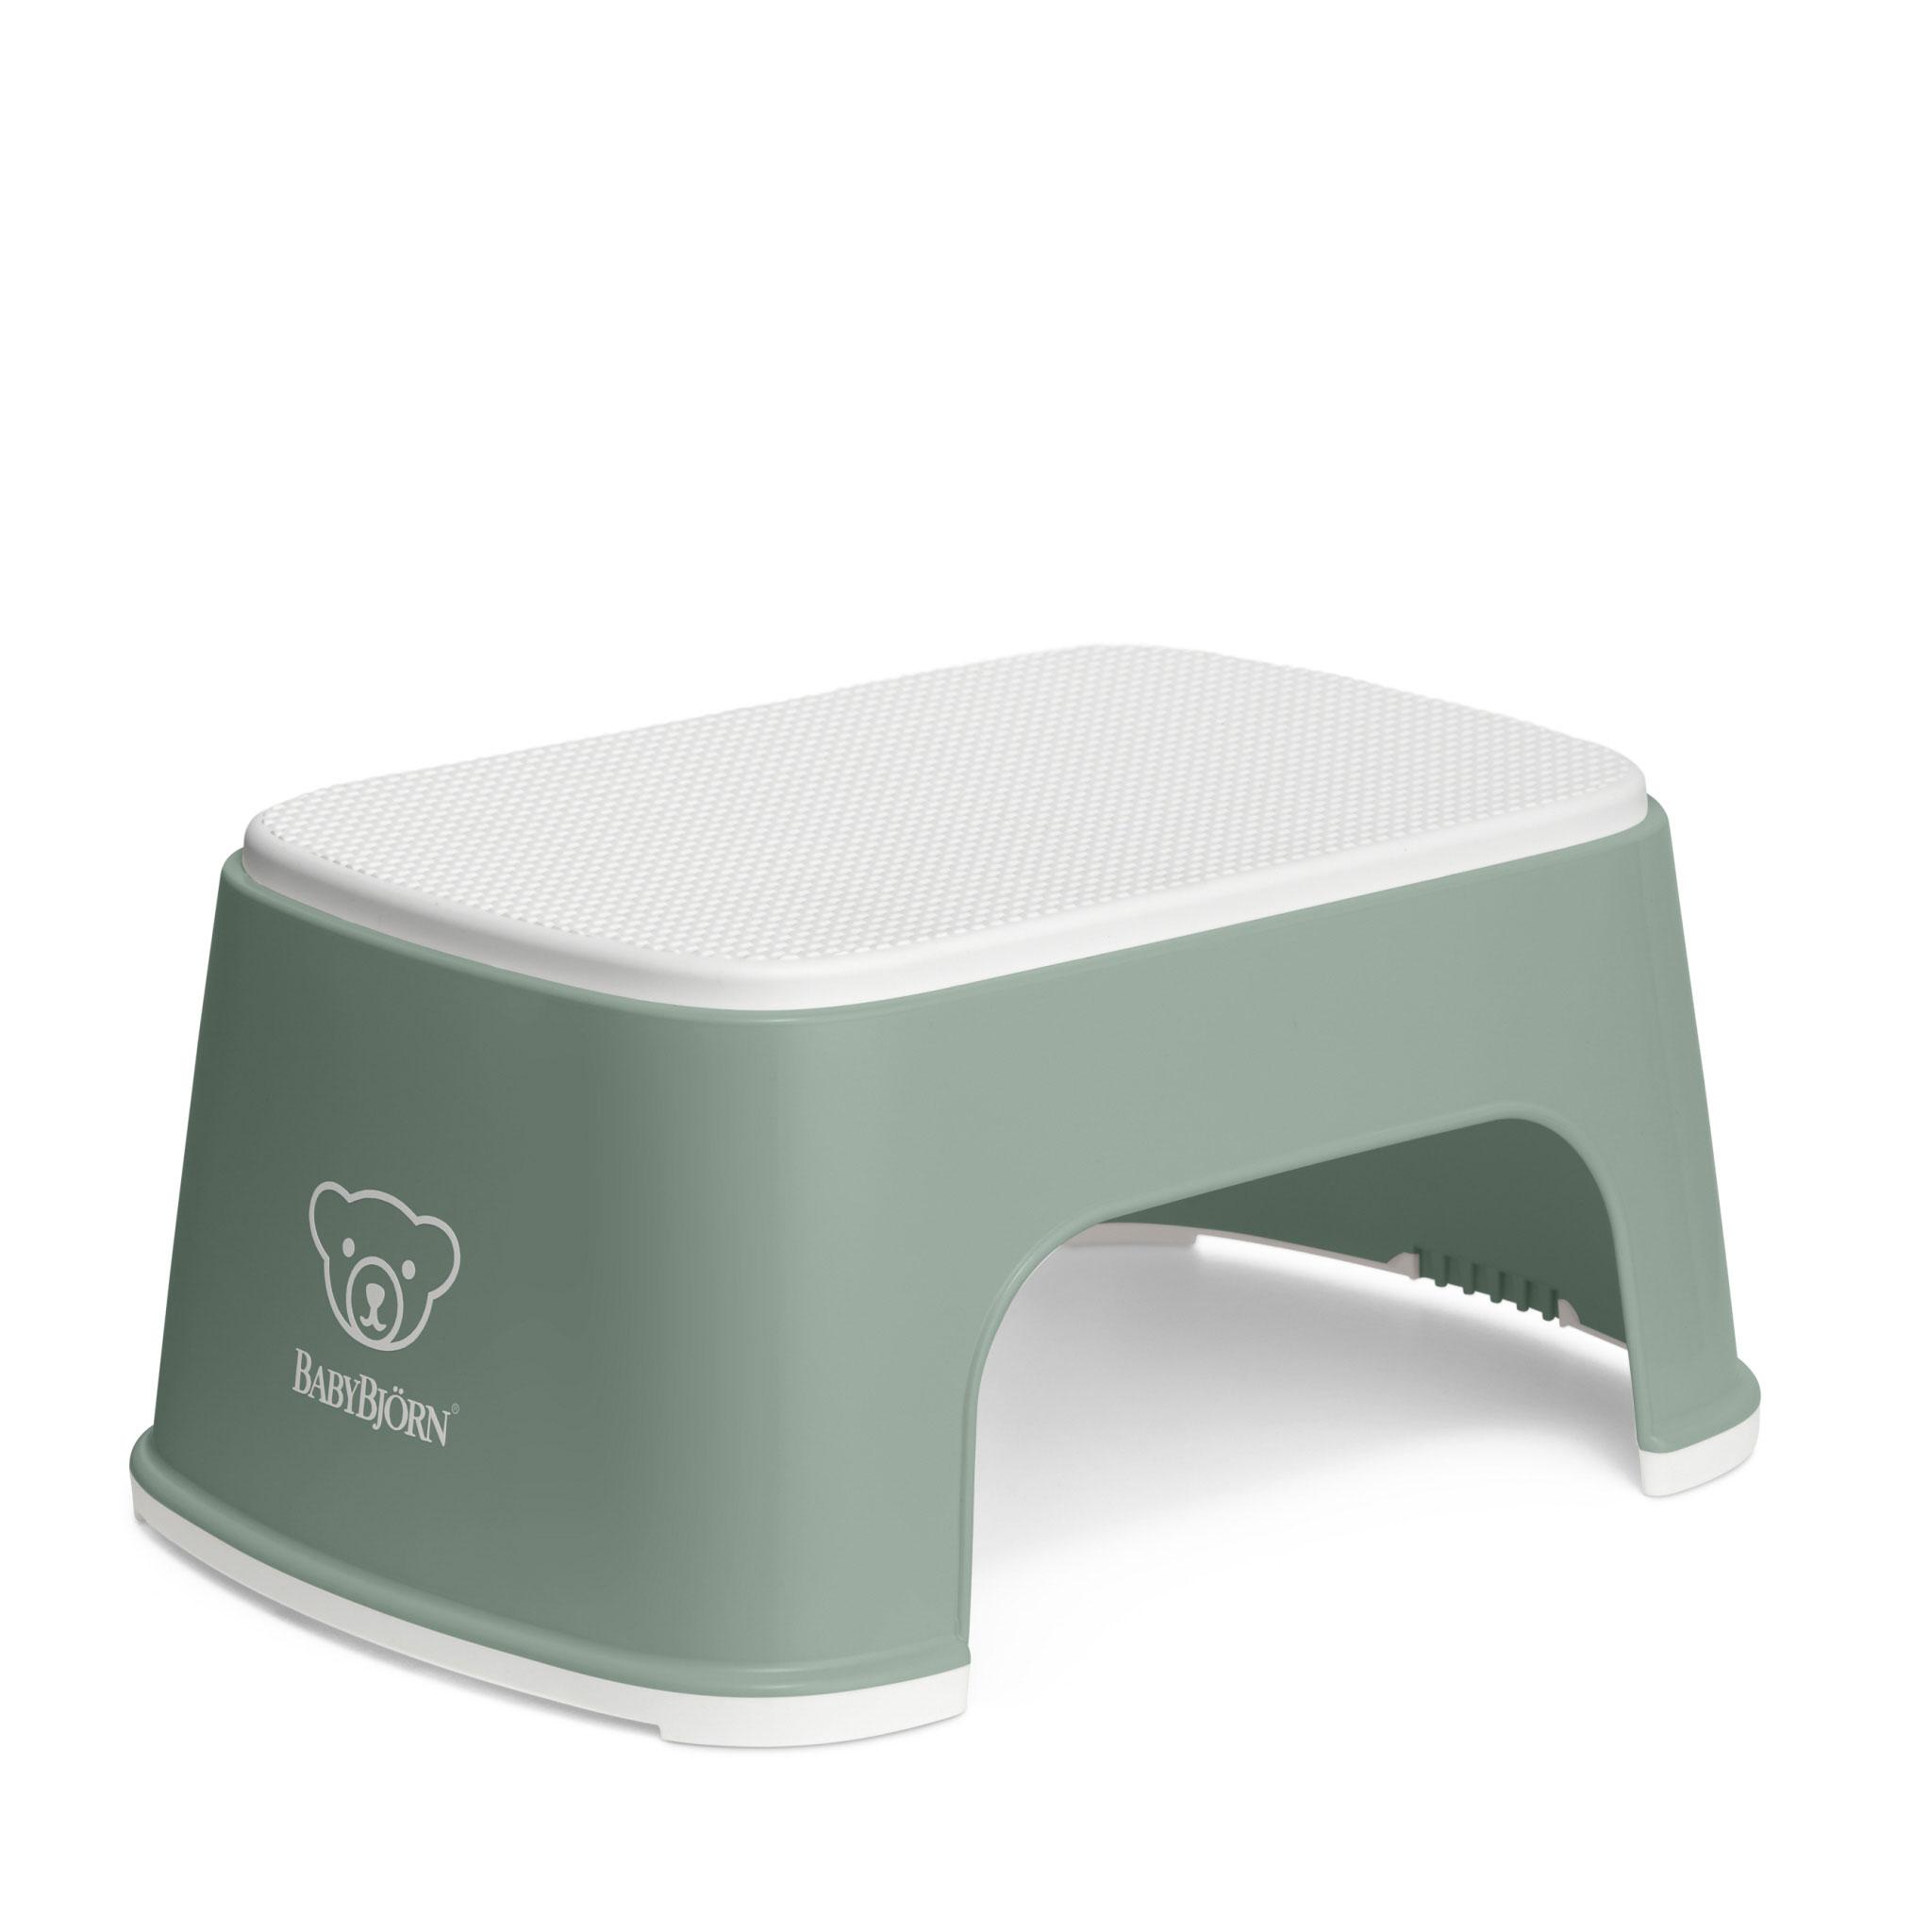 Treapta inaltator pentru baie – Step Stool – Deep Green / White